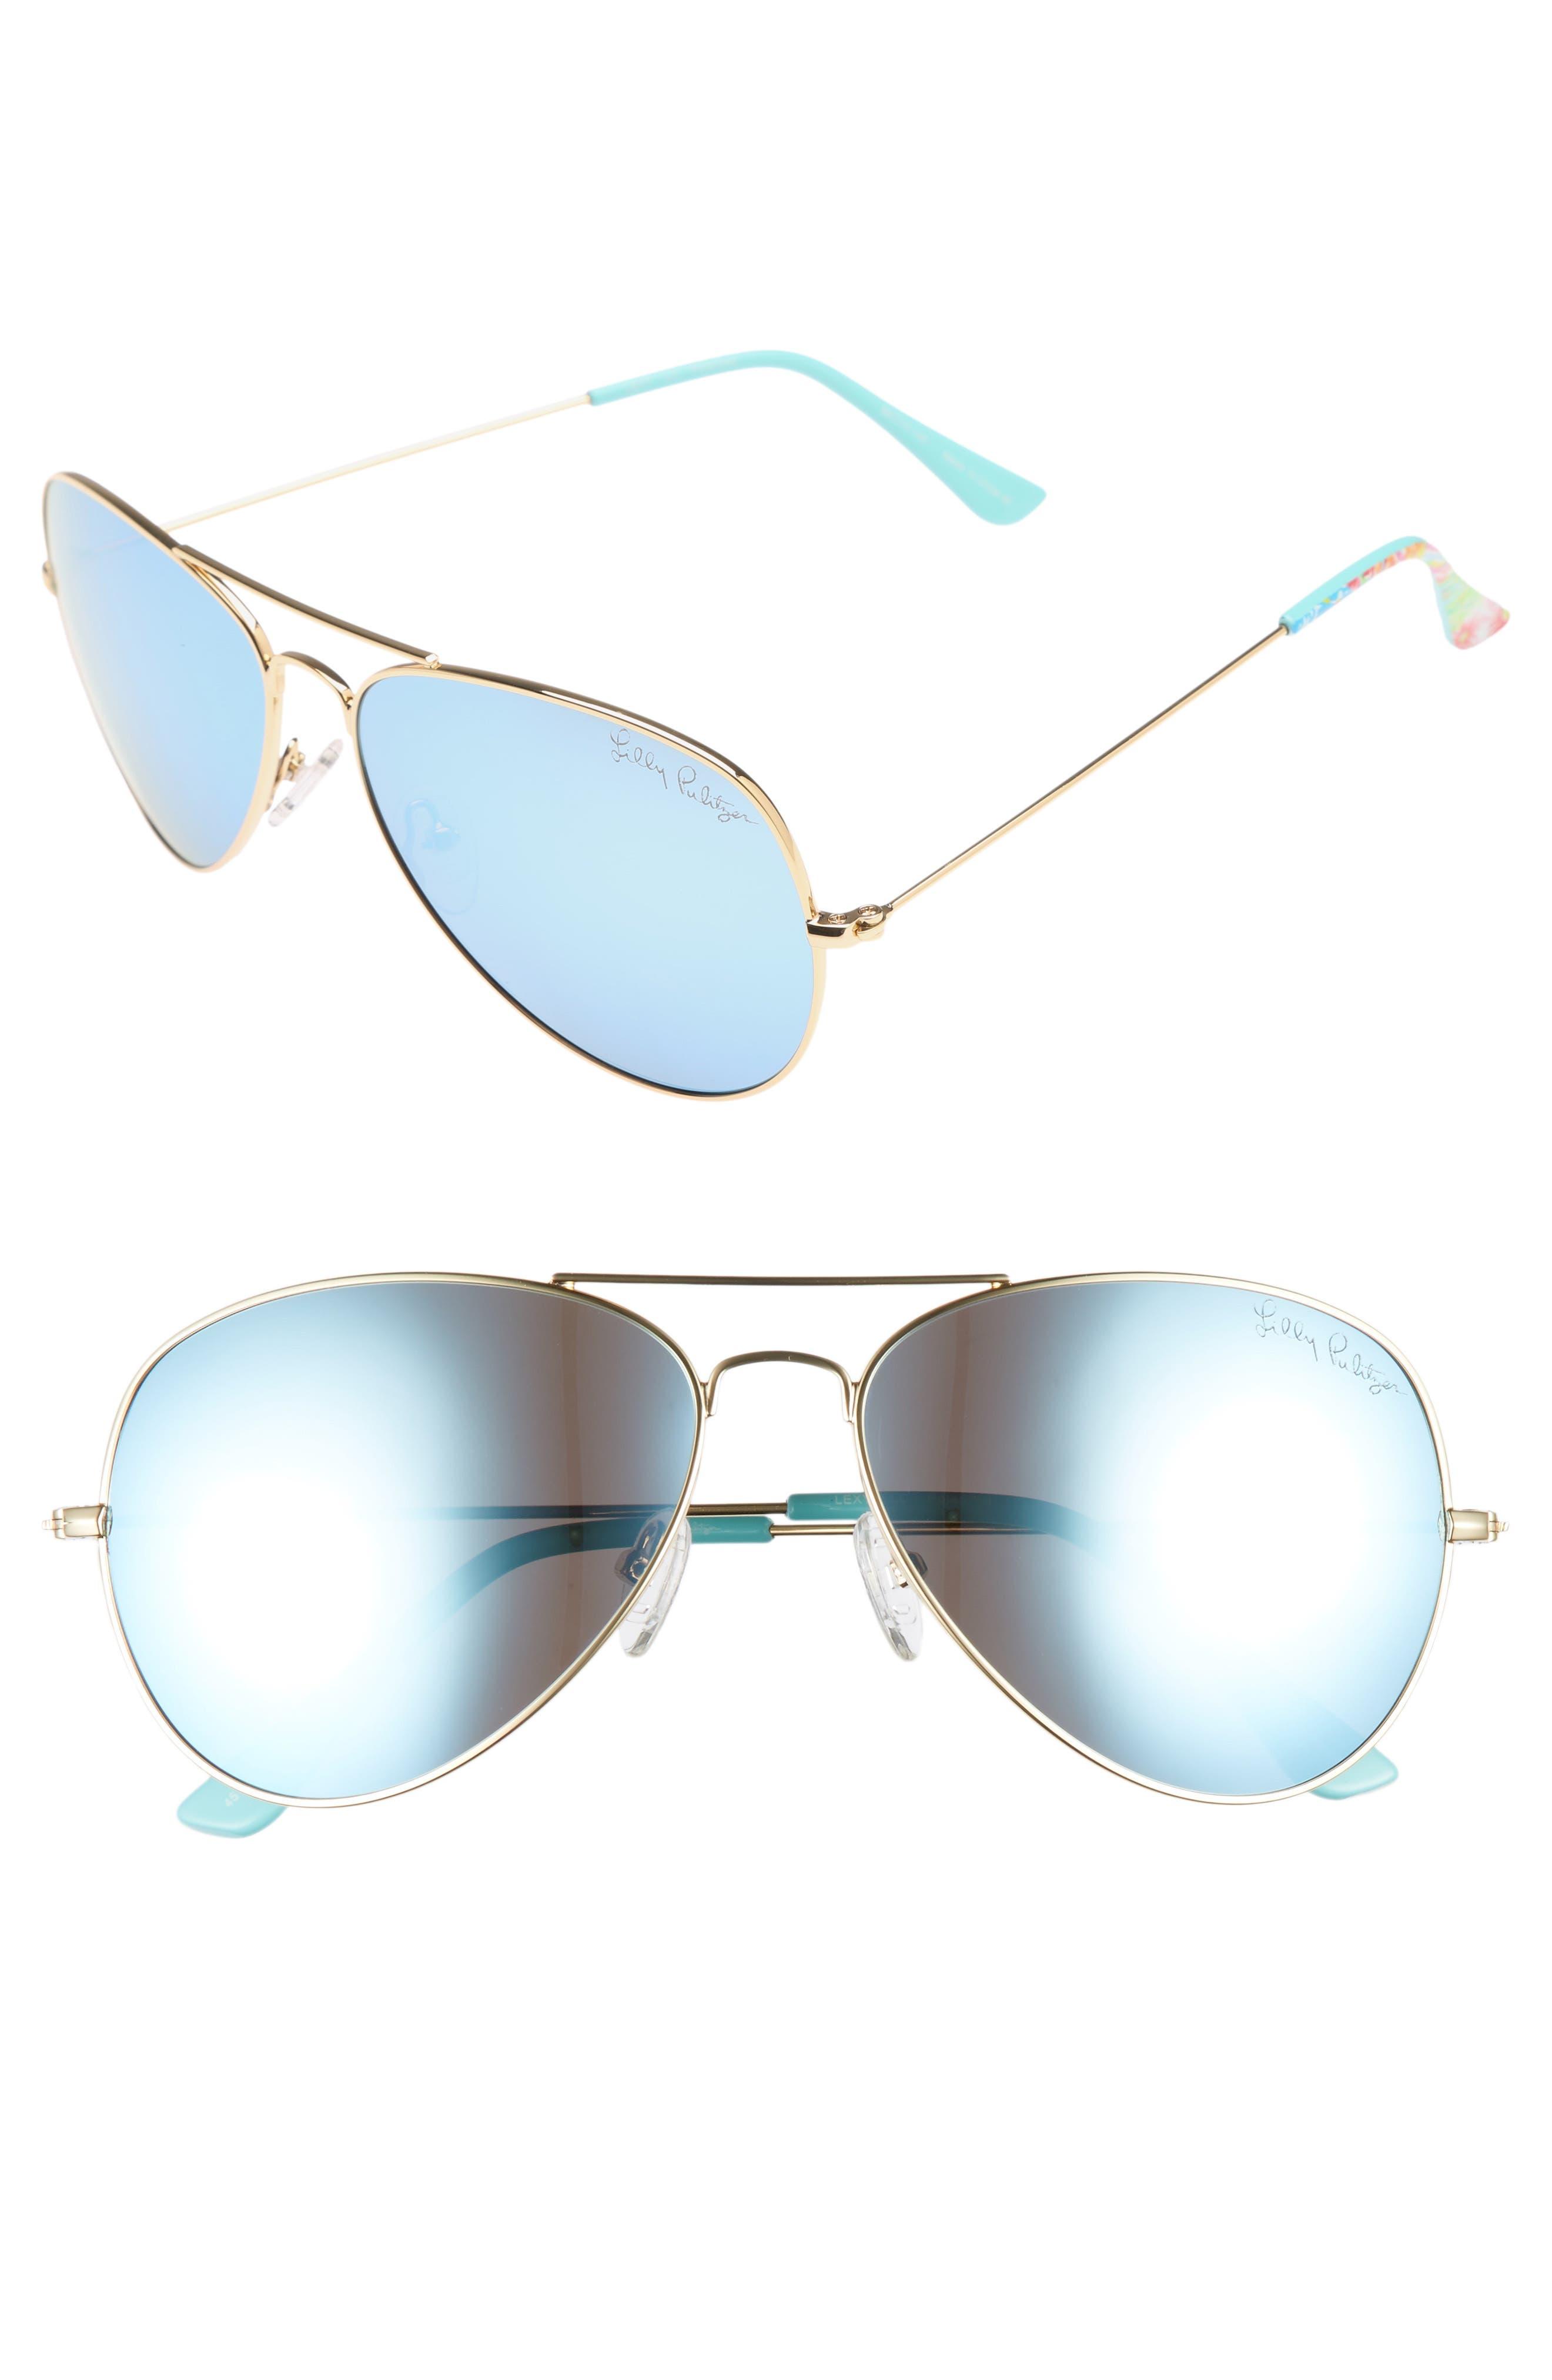 Lexy 59mm Polarized Aviator Sunglasses,                             Main thumbnail 1, color,                             BLUE 2